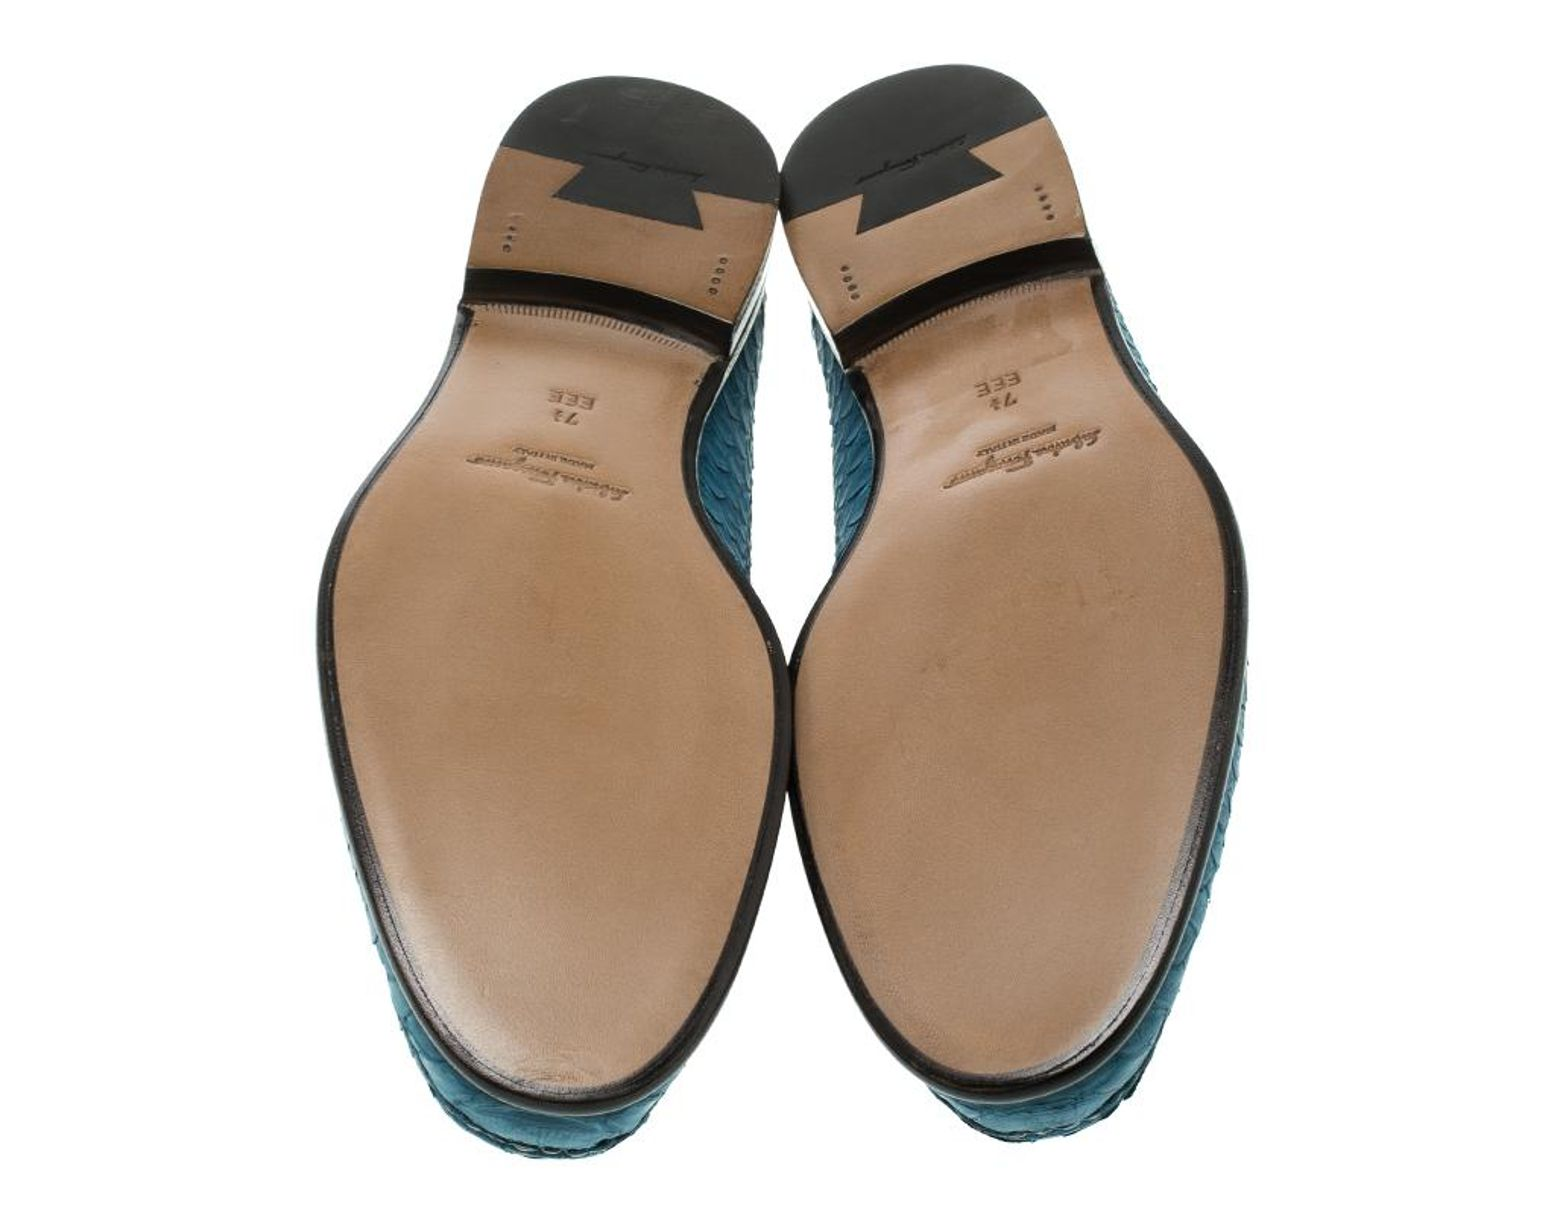 4db79d8e330f8 Ferragamo Blue Python Leather Mason Loafers Size 41.5 in Blue for Men - Lyst